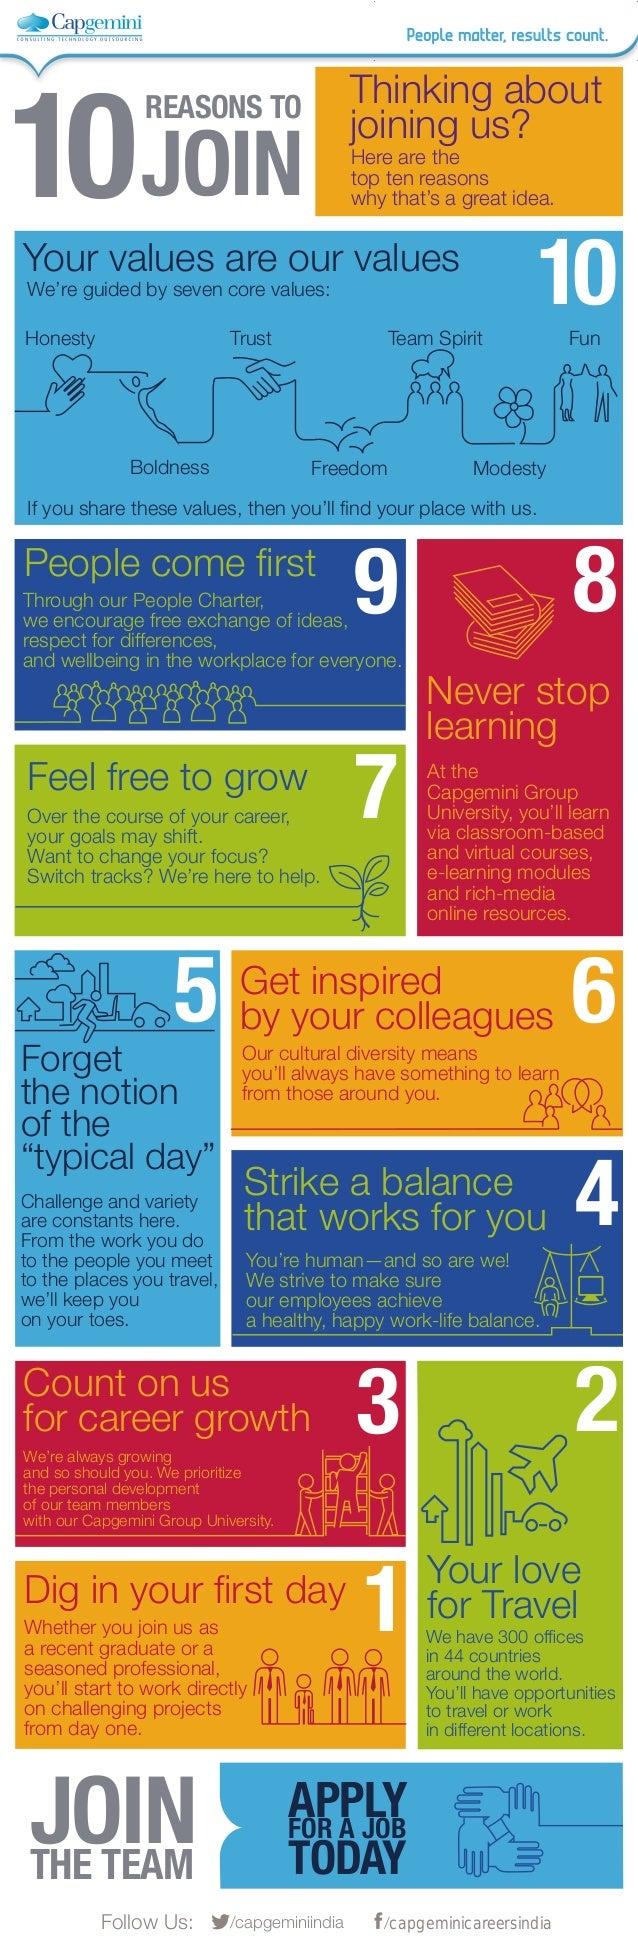 Ten Reasons to Join Capgemini